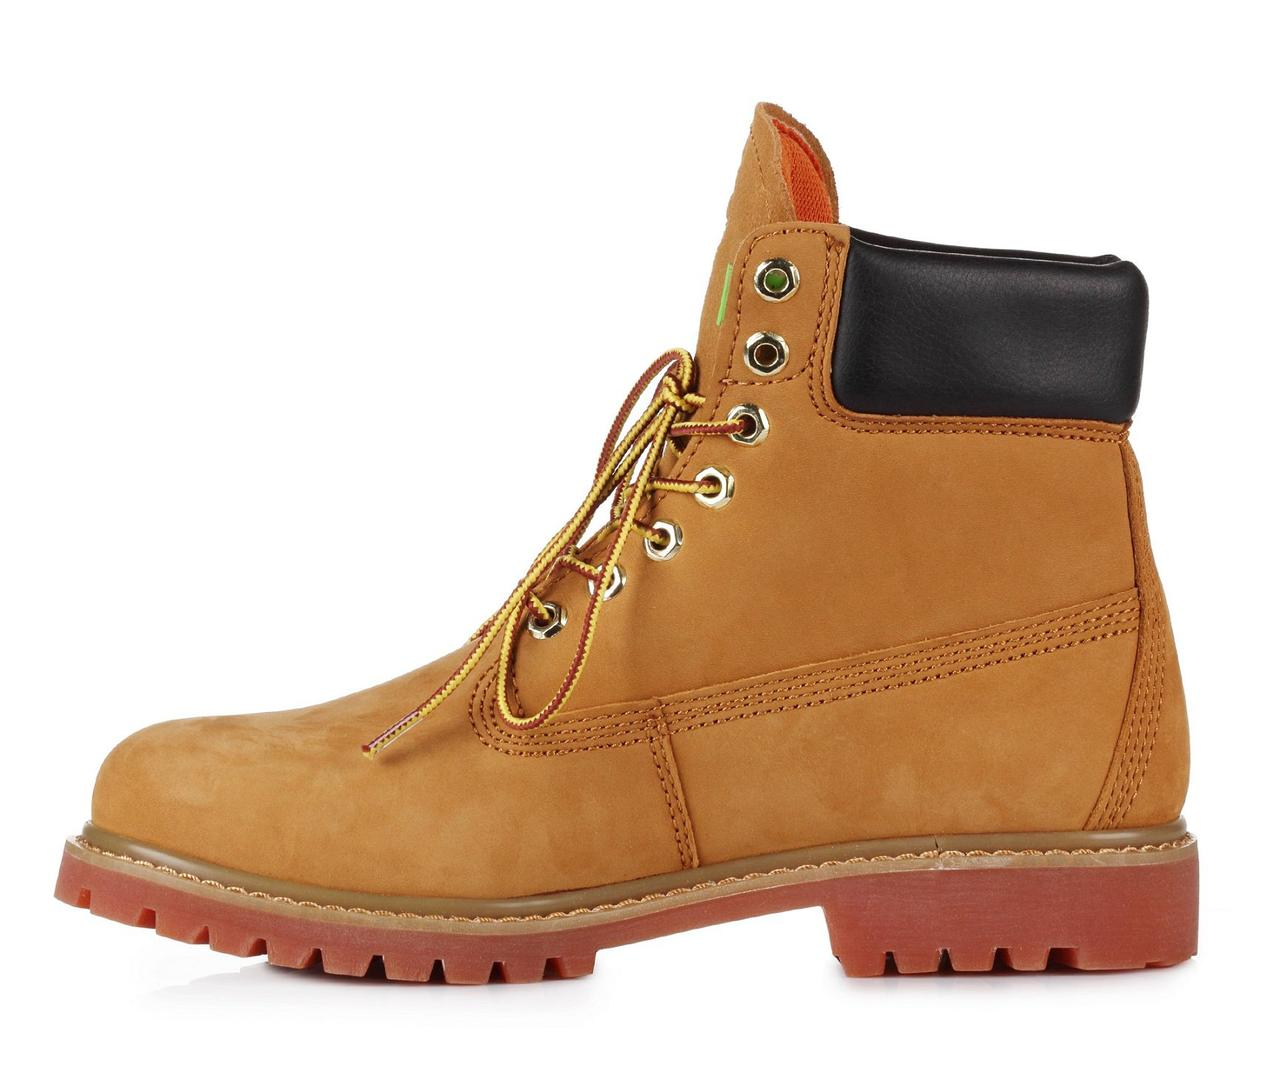 Мужские ботинки Timberland Classic 6 inch Yellow Lite Edition (Тимберленд) - рыжие